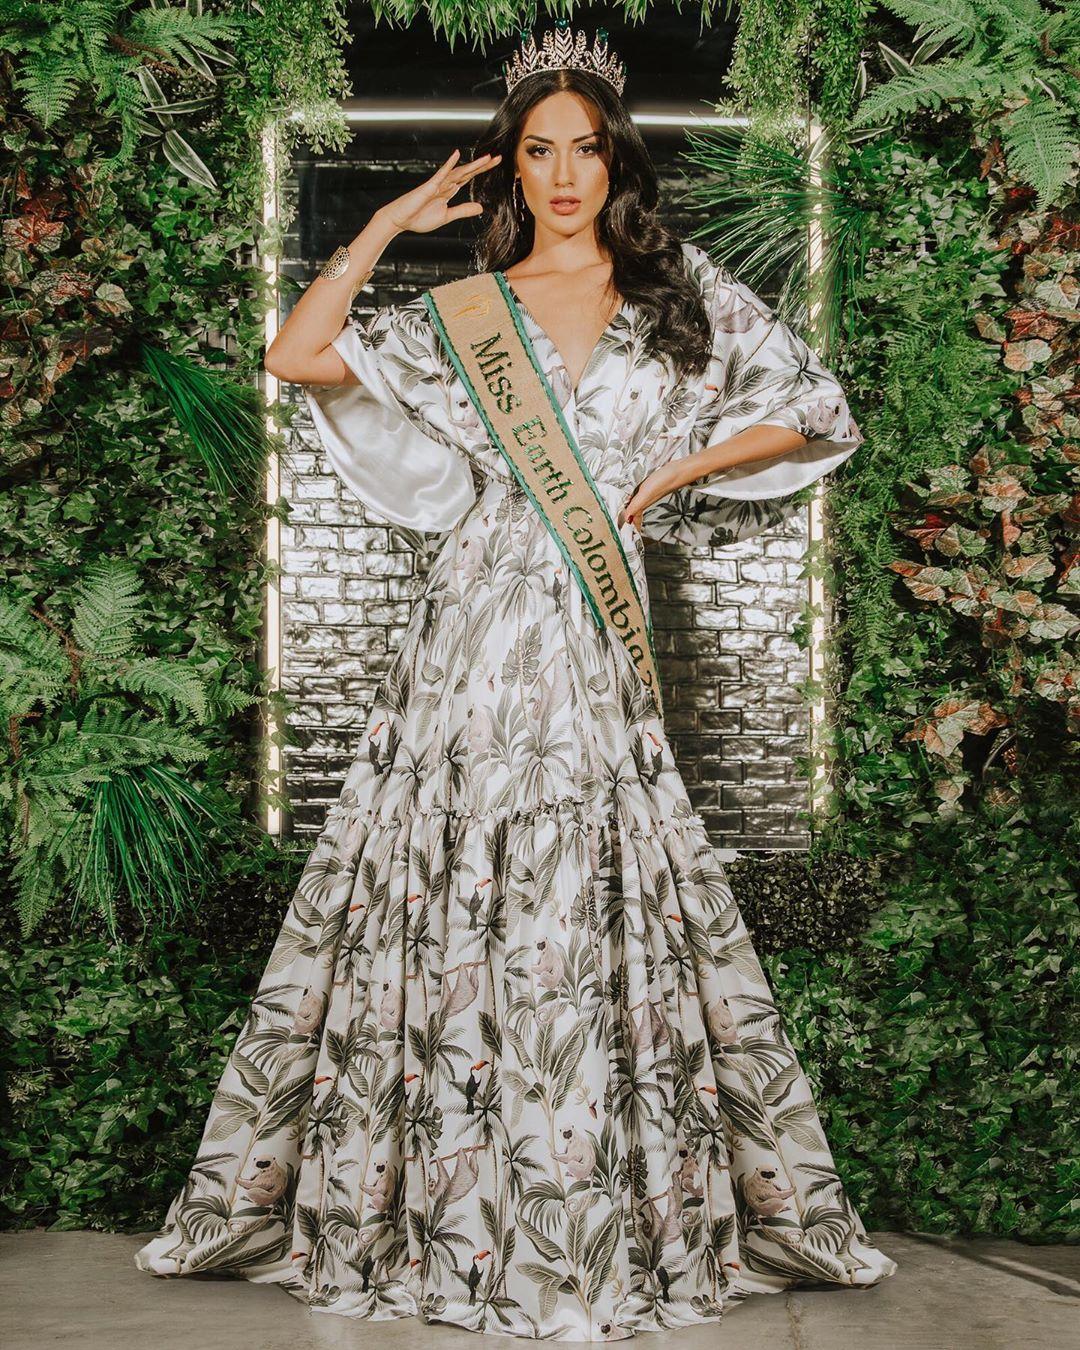 yenny katherine carrillo, top 20 de miss earth 2019/reyna mundial banano 2017. - Página 4 67725710